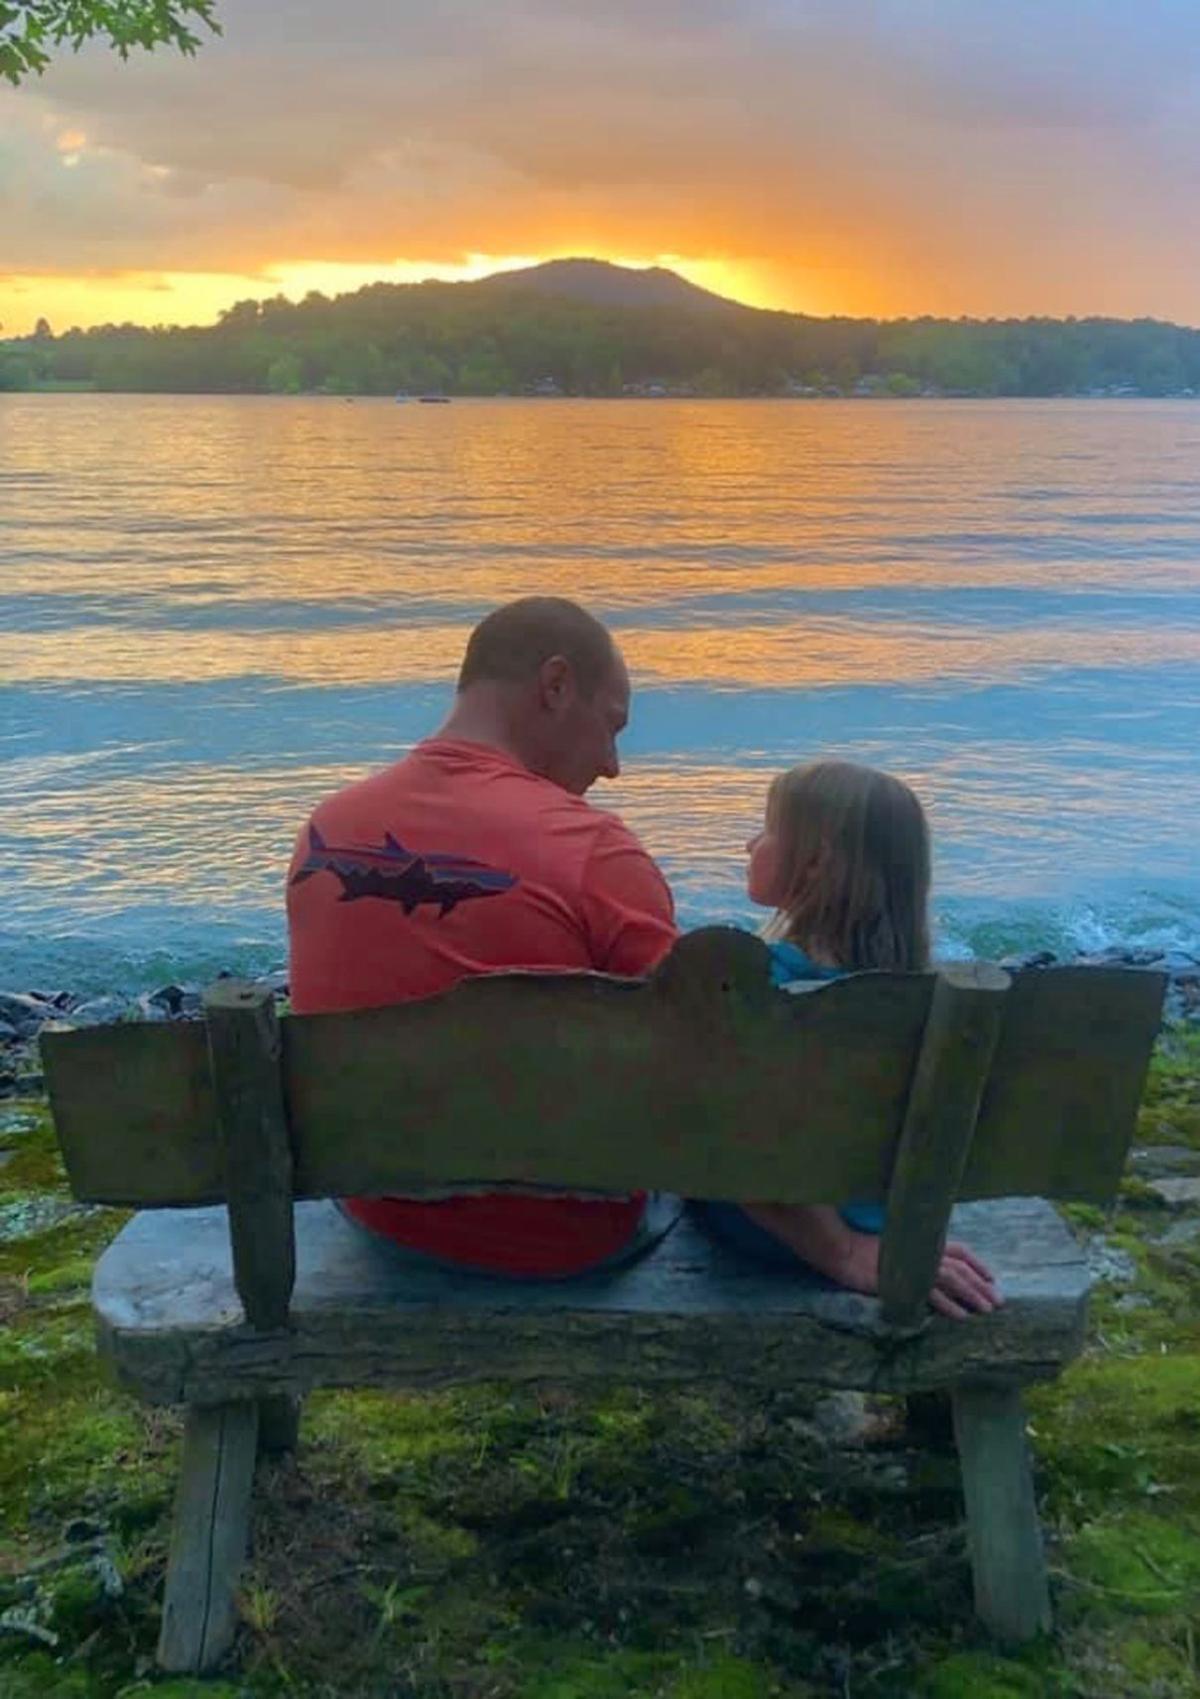 061720_MNS_Geiger Jeff Geiger and daughter